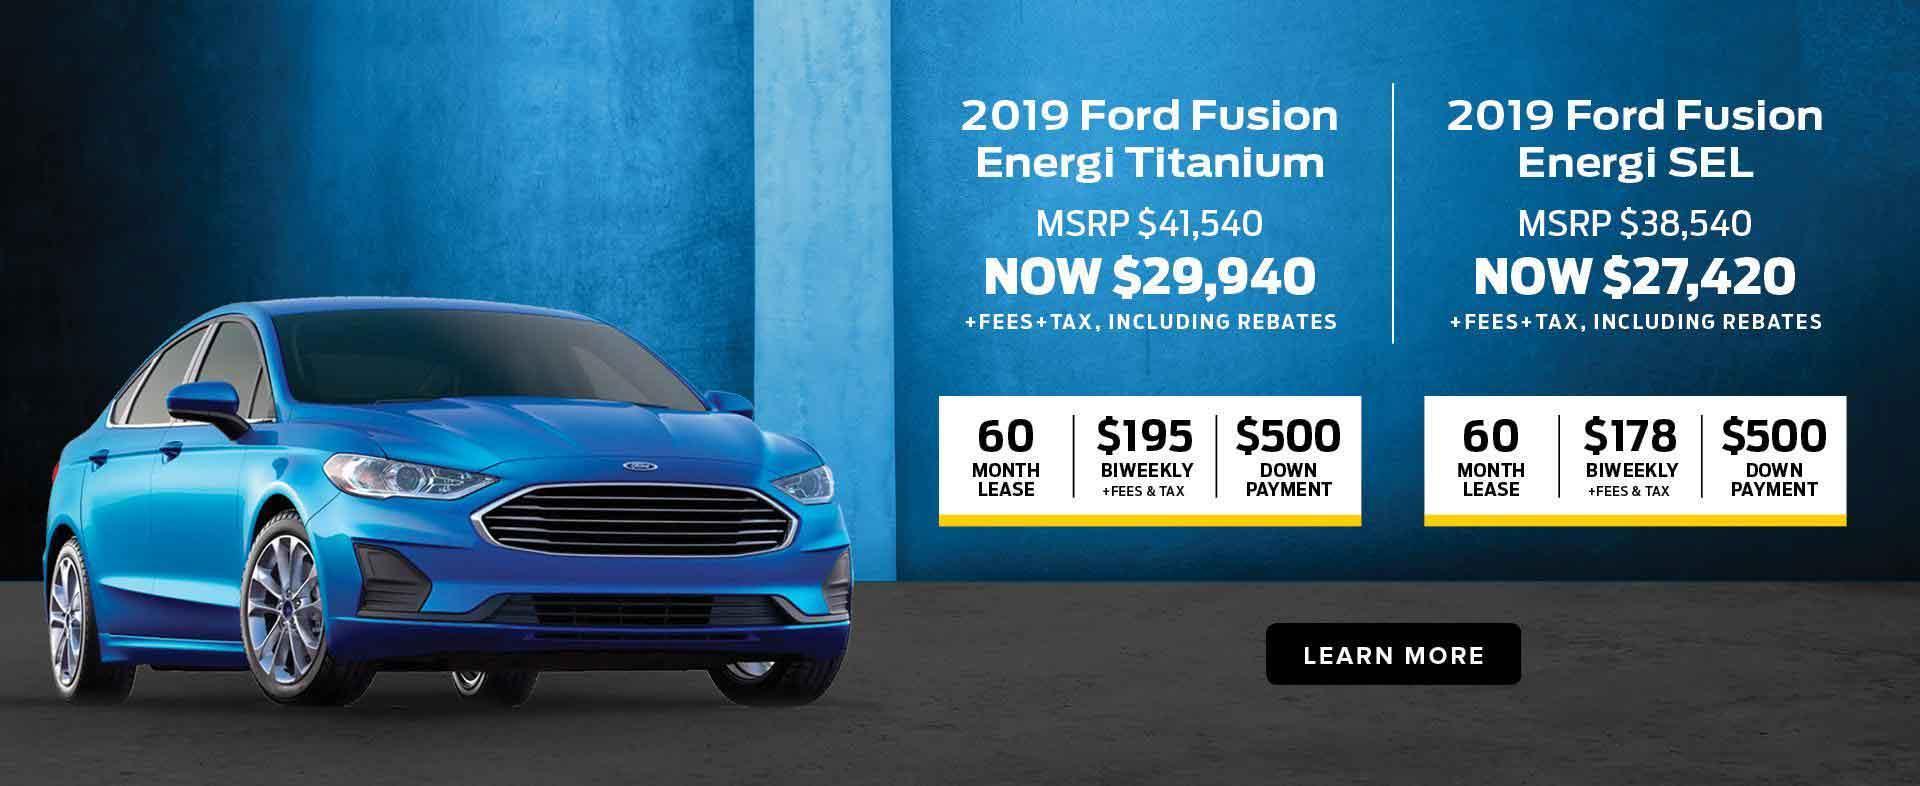 Fusion Energi